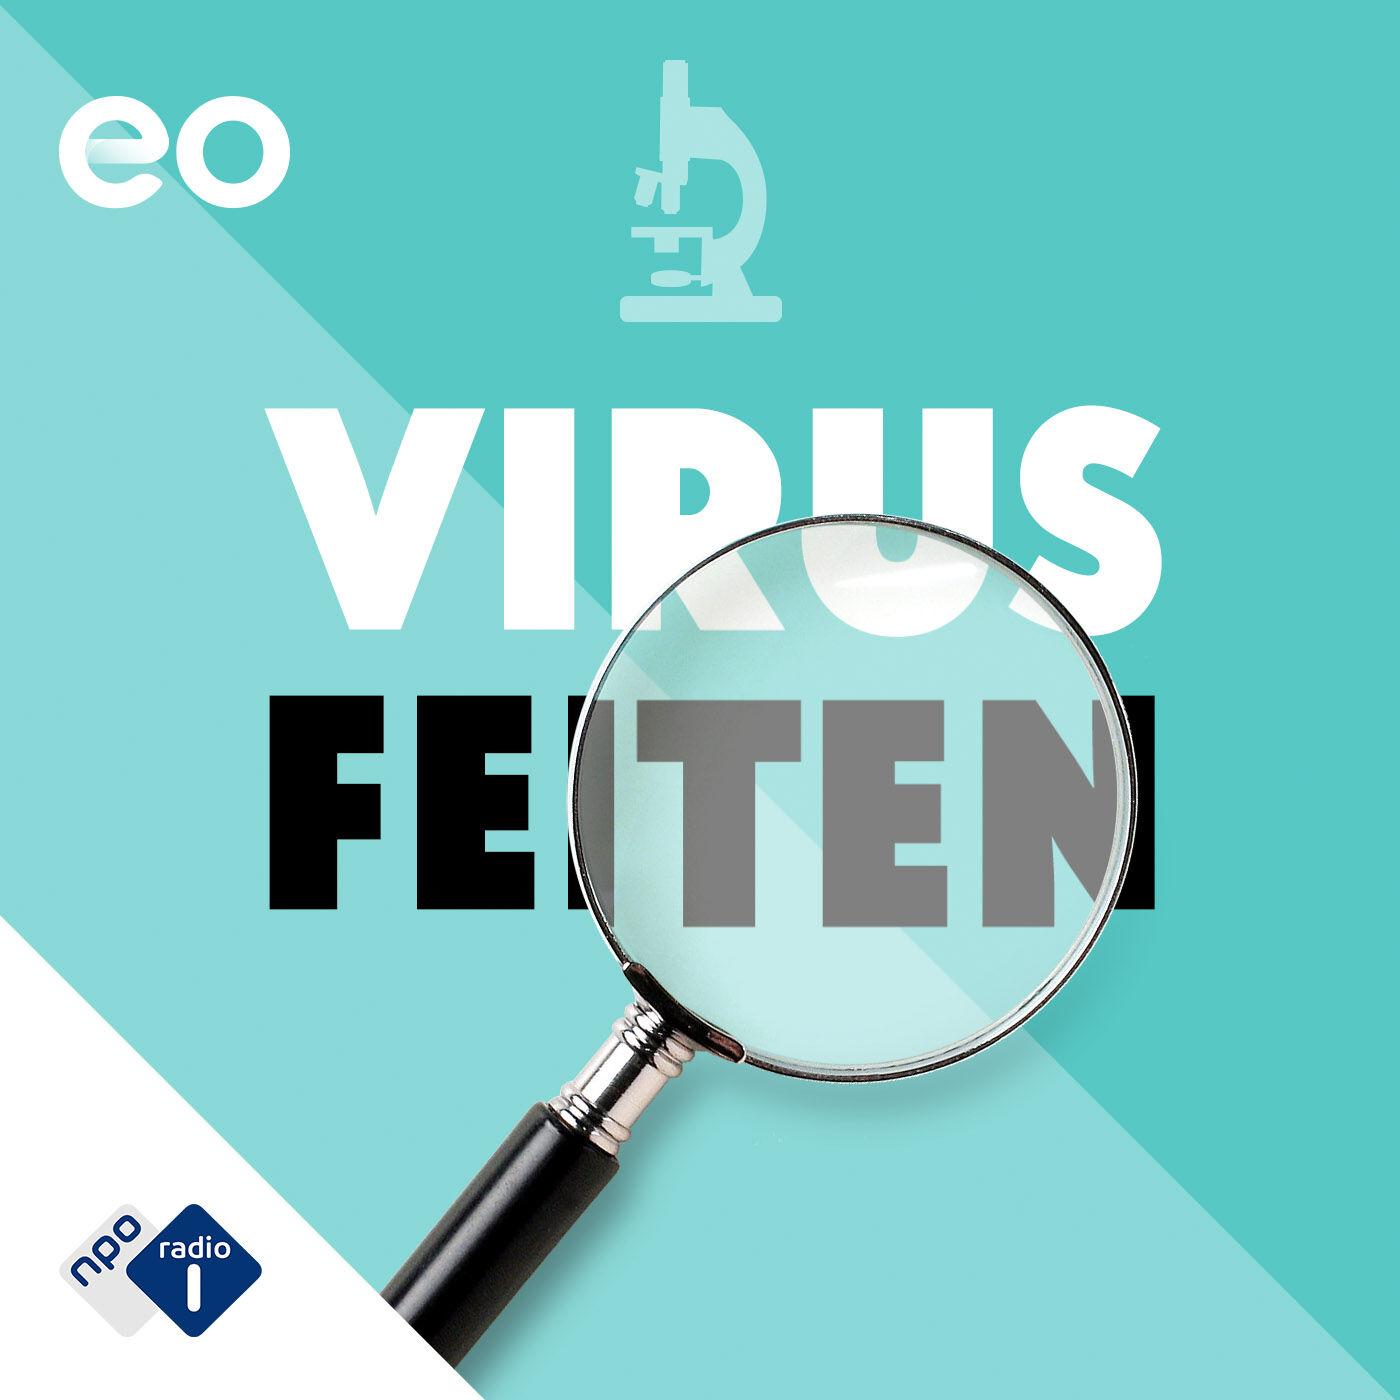 Virusfeiten podcast show image